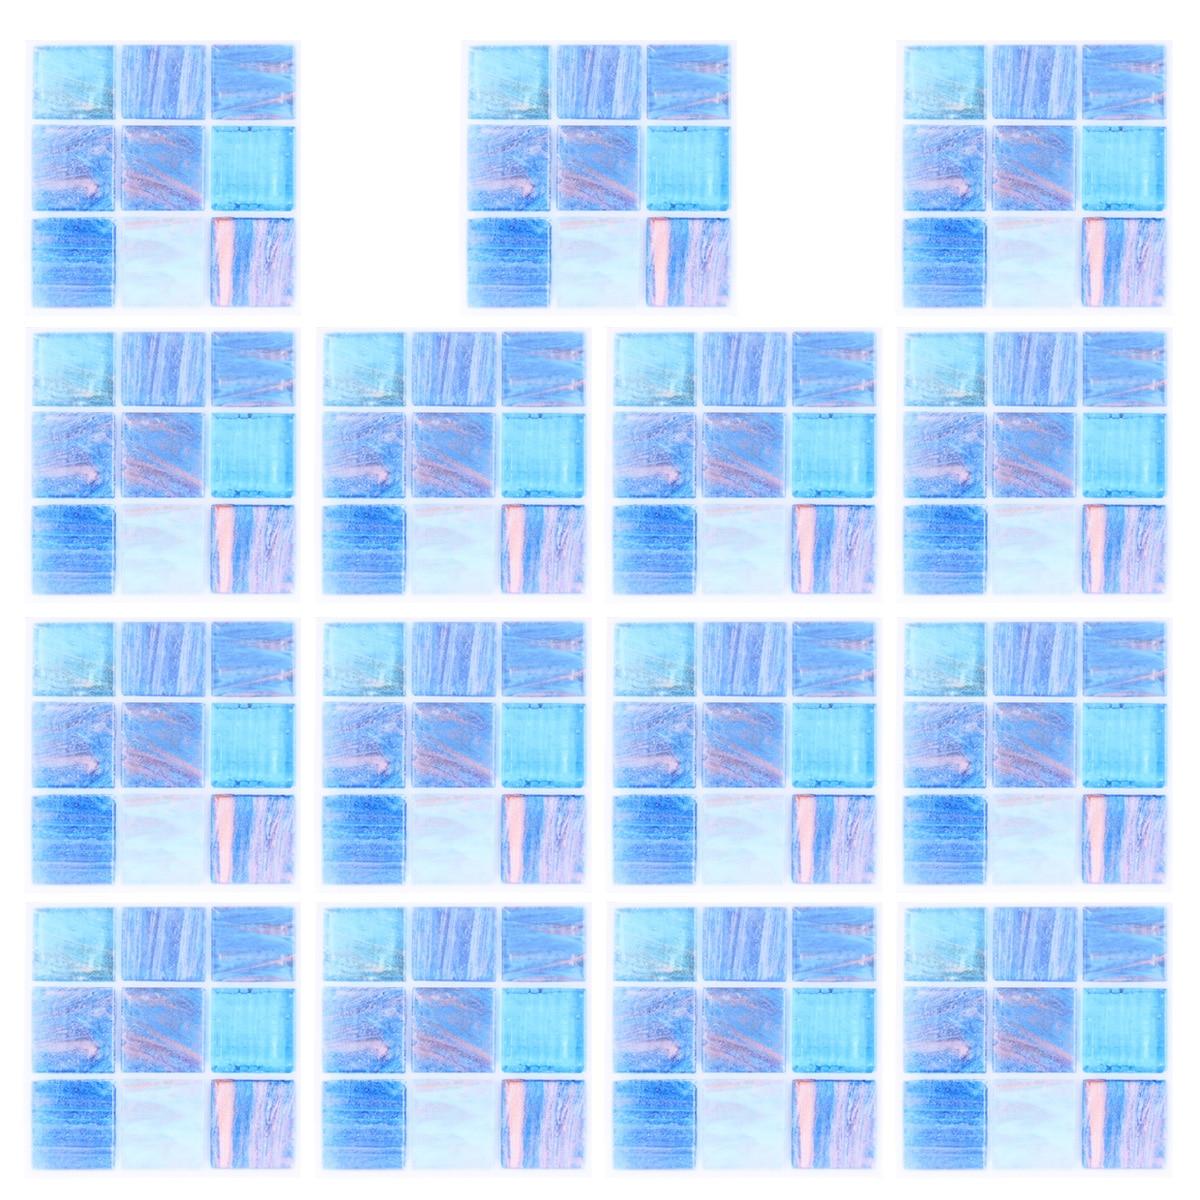 15 unidades de pegatinas de pared 3D autoadhesivas negro gris cristal mosaico patrón de pared a prueba de agua pegatinas de pared Anti-aceite para el hogar